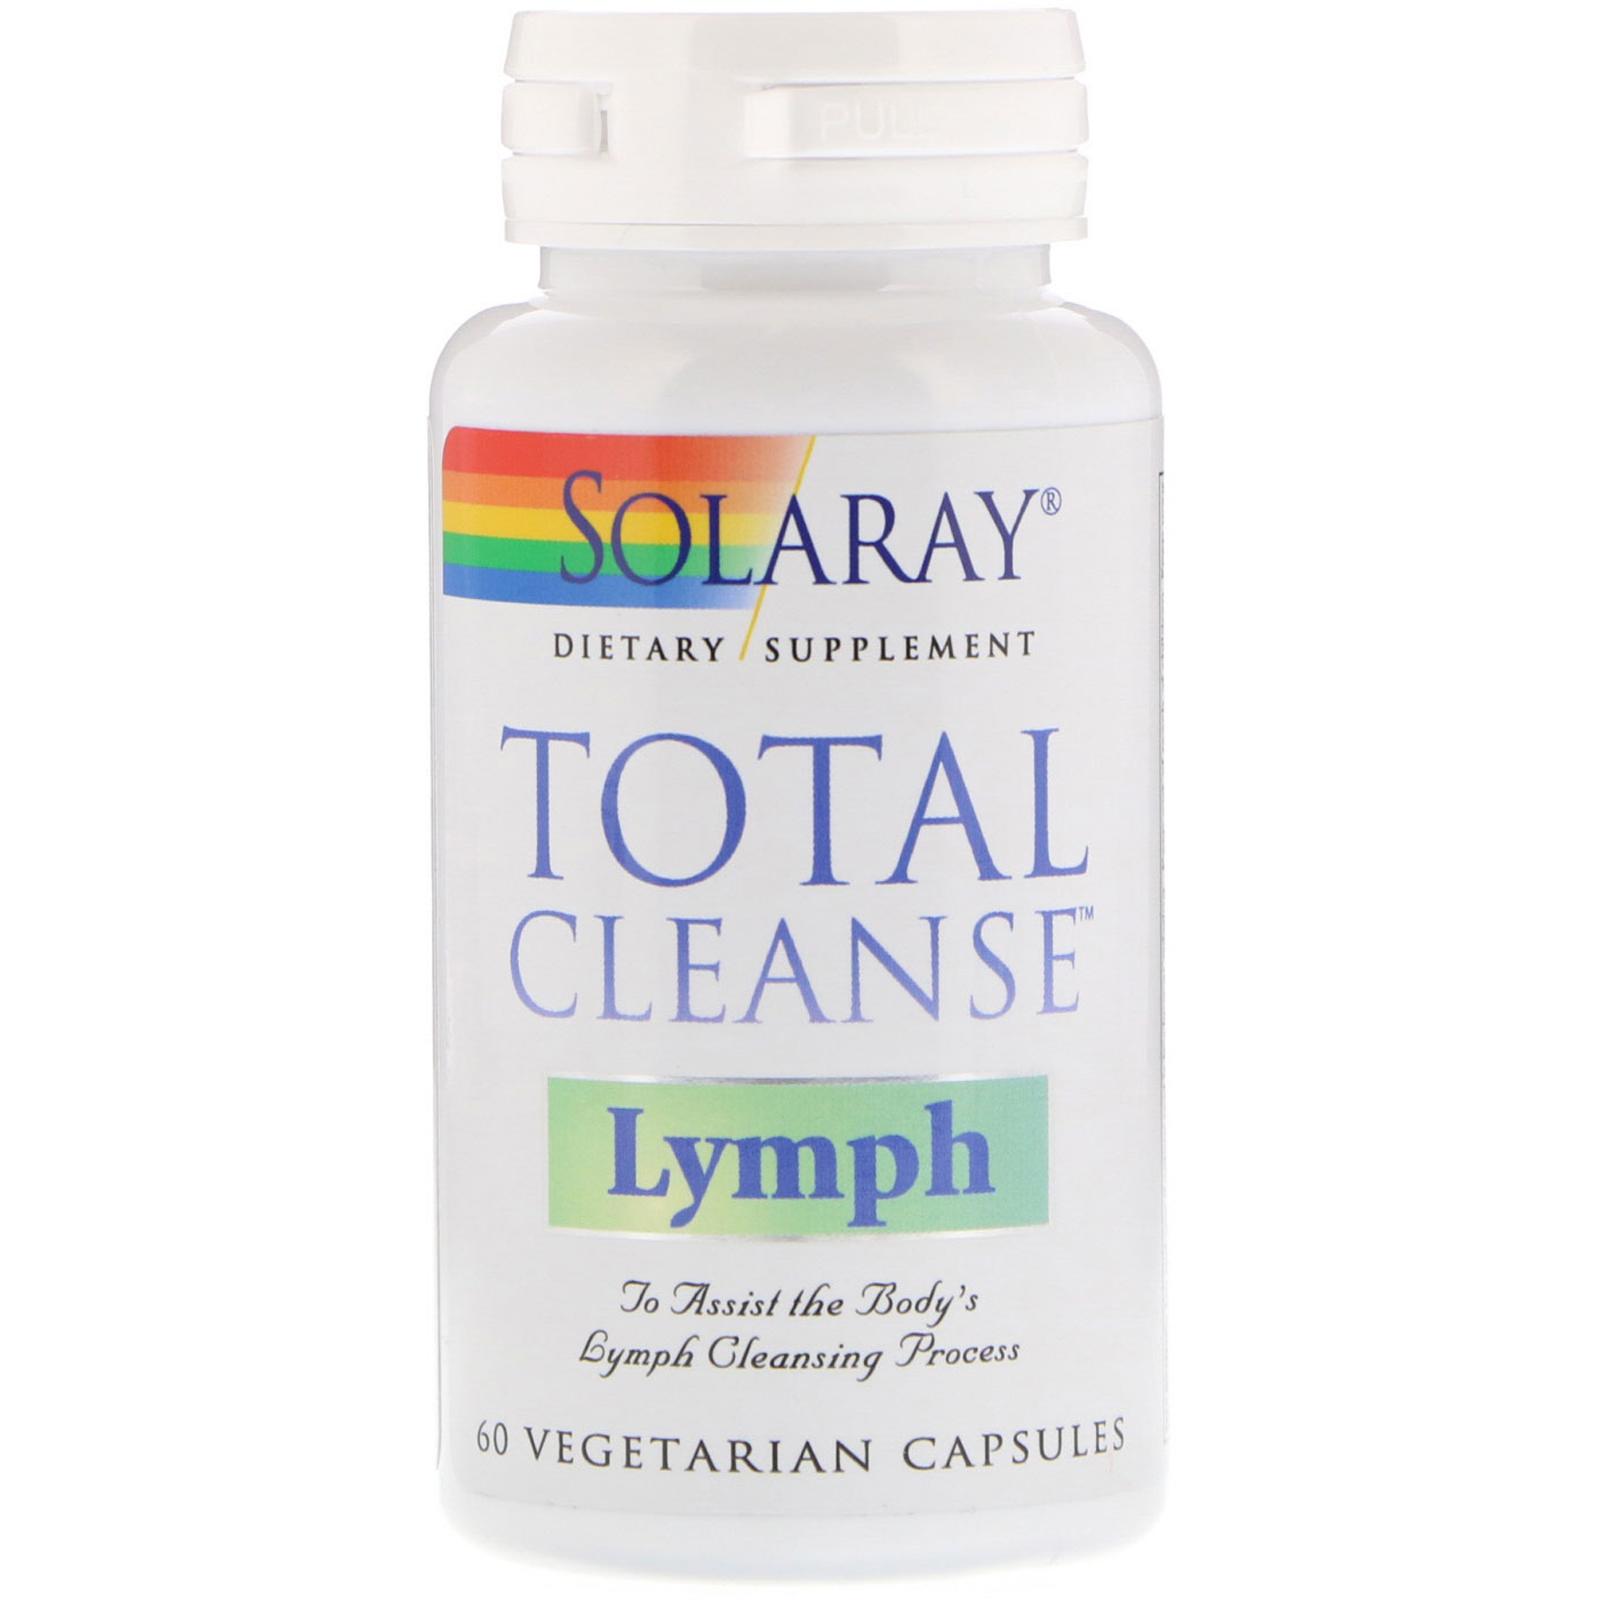 lymph branded capsules)